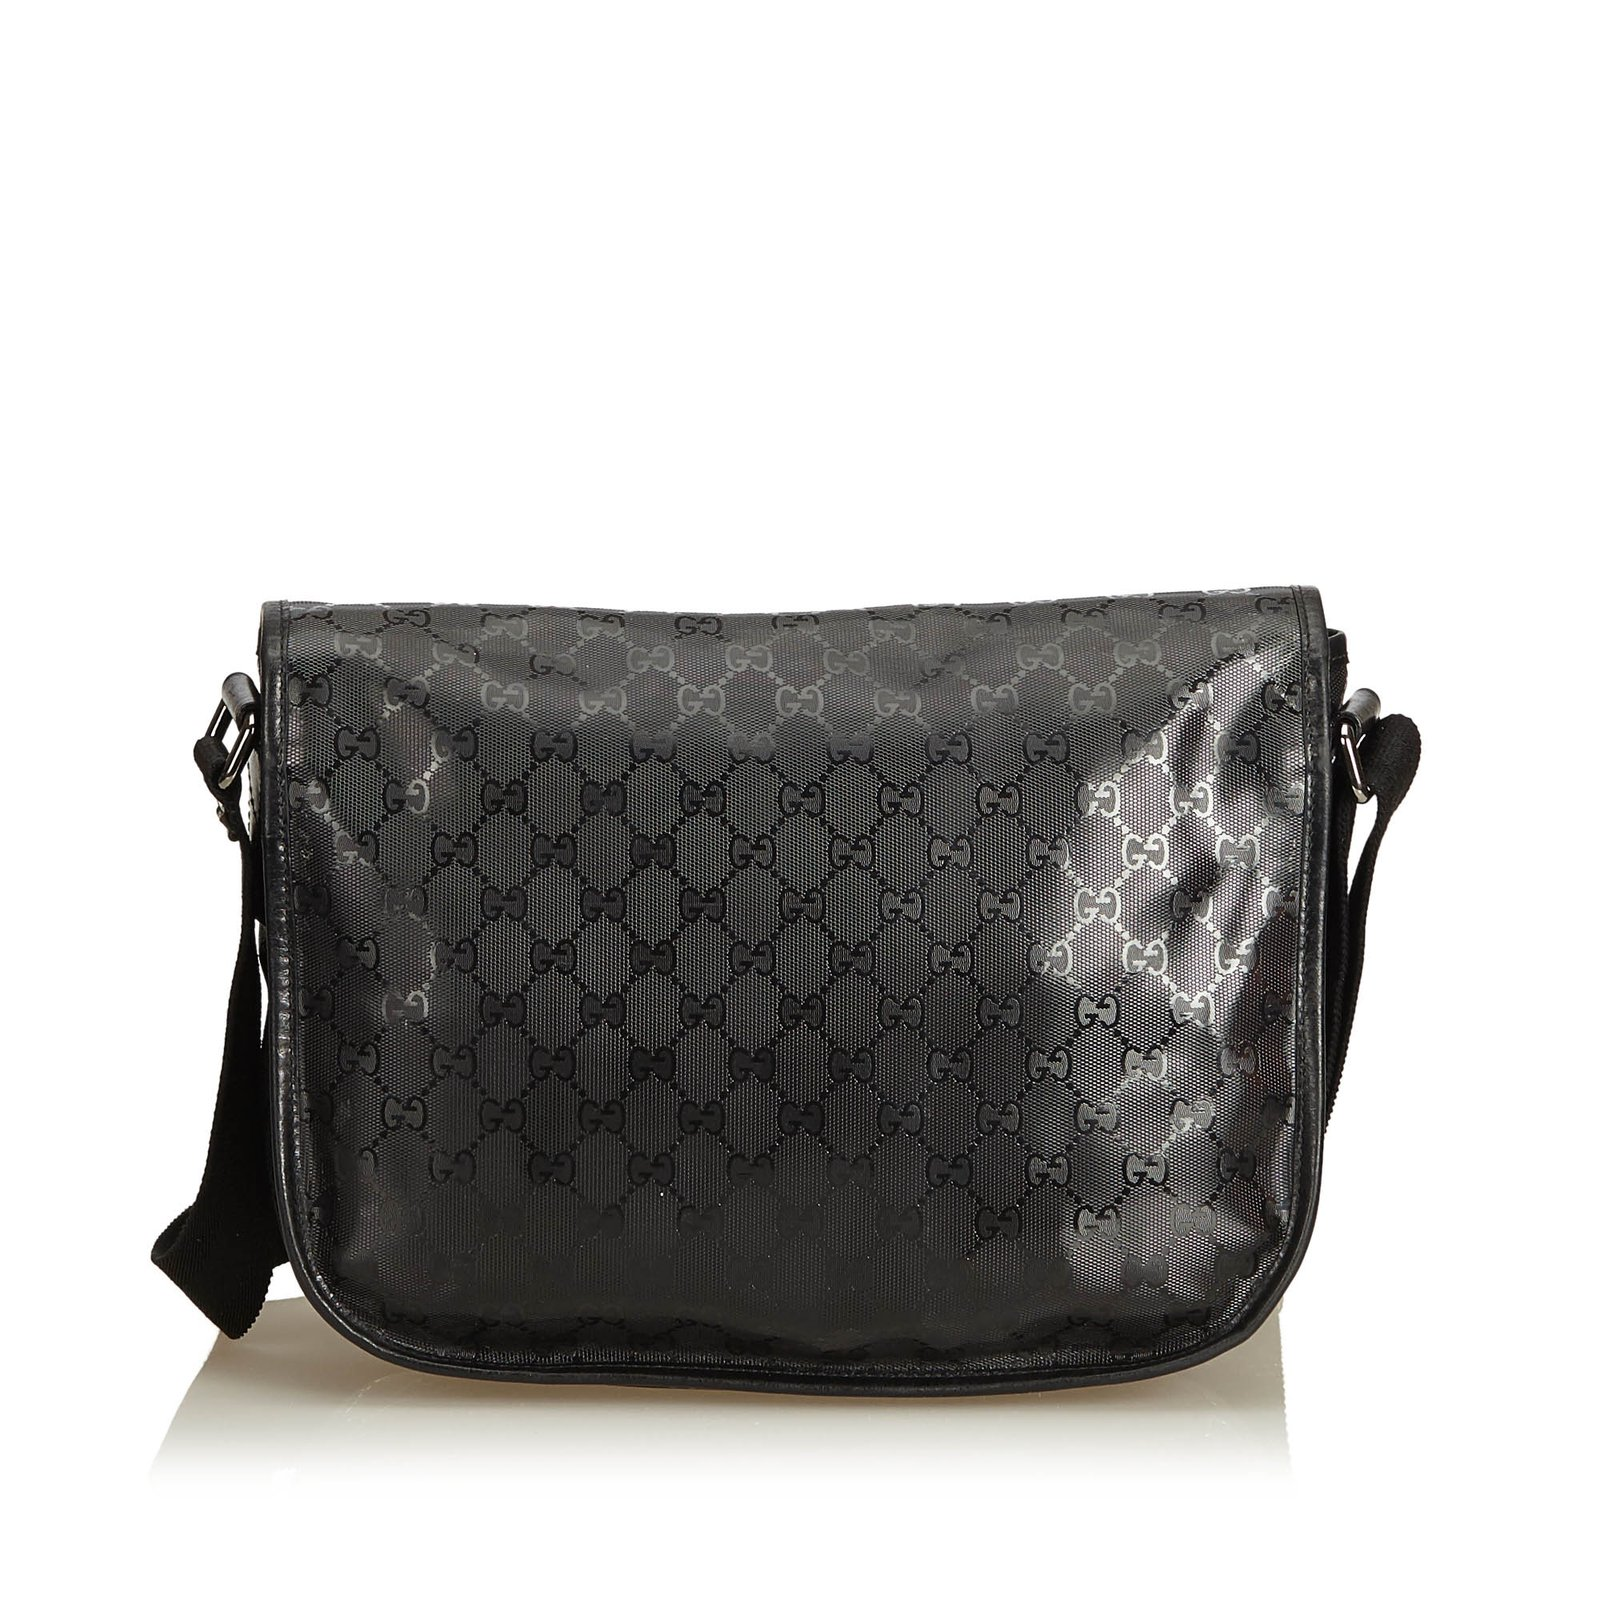 178631224ead Gucci Guccissima Imprime Messenger Bag Handbags Leather,Other,Plastic Black  ref.94744 - Joli Closet